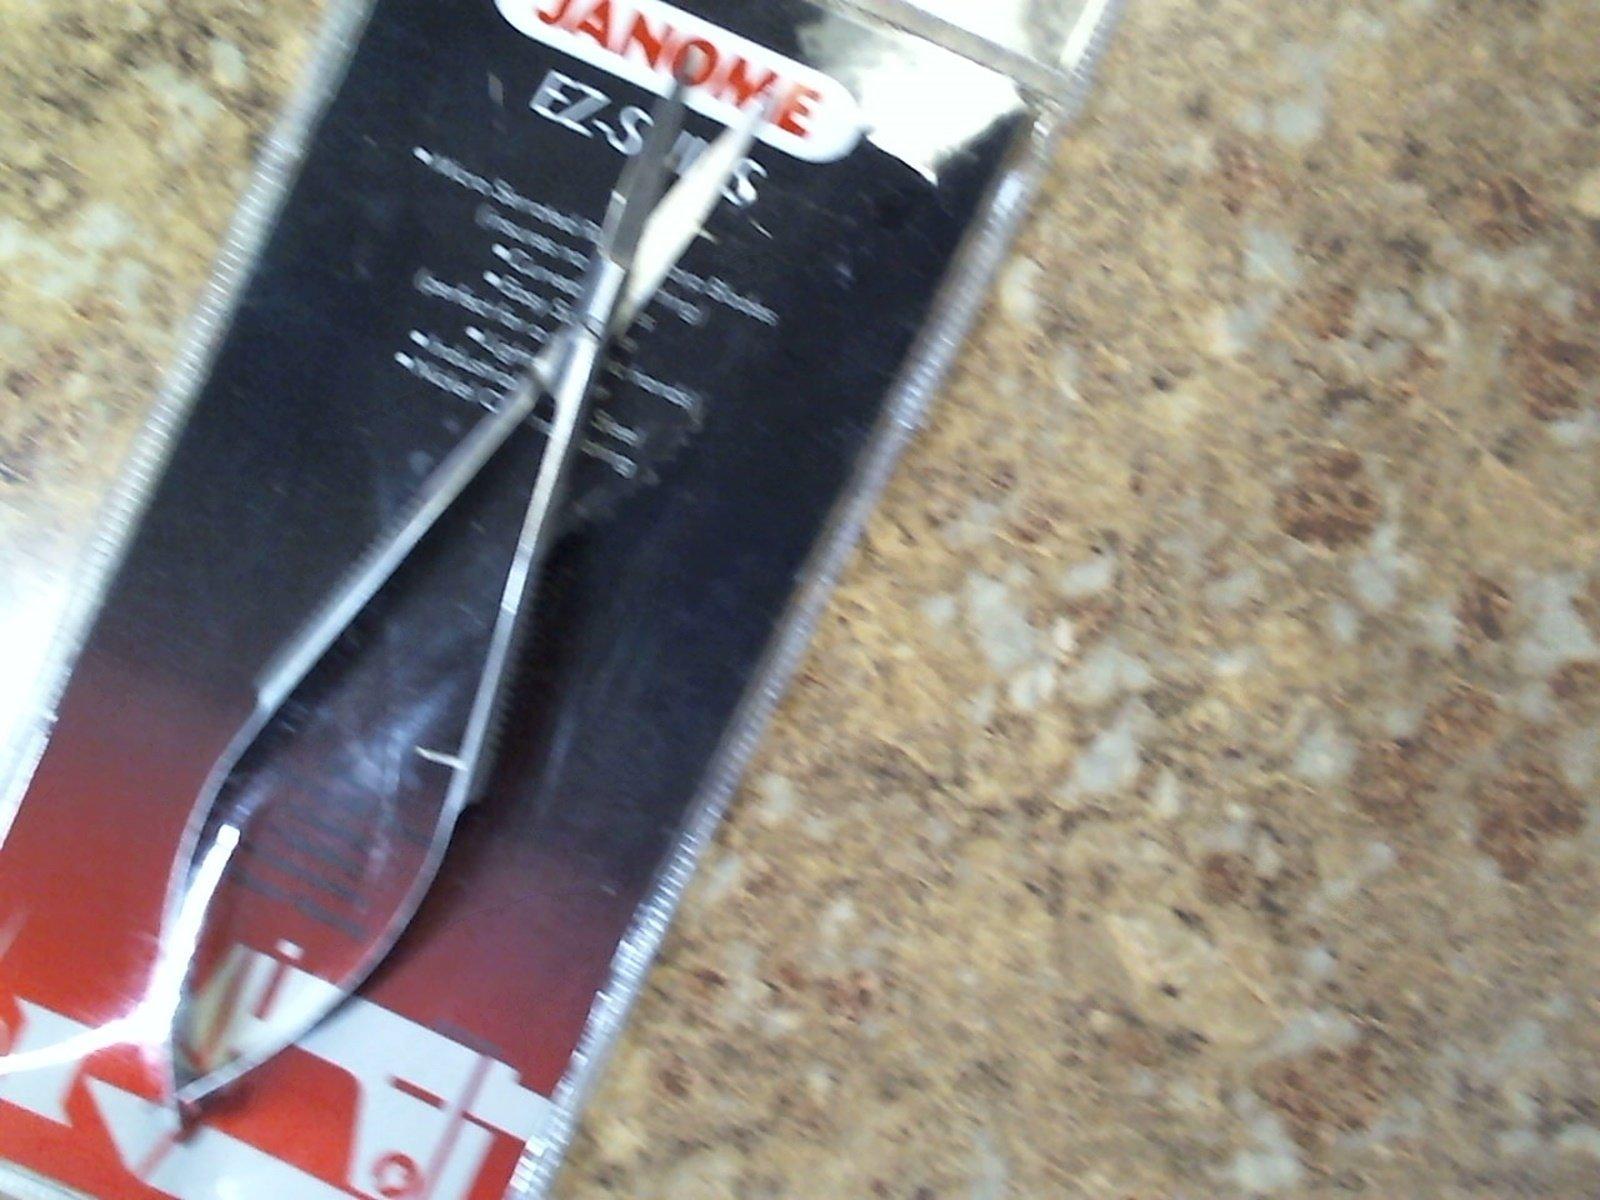 Janome EZ-Snips - Curved Scissors